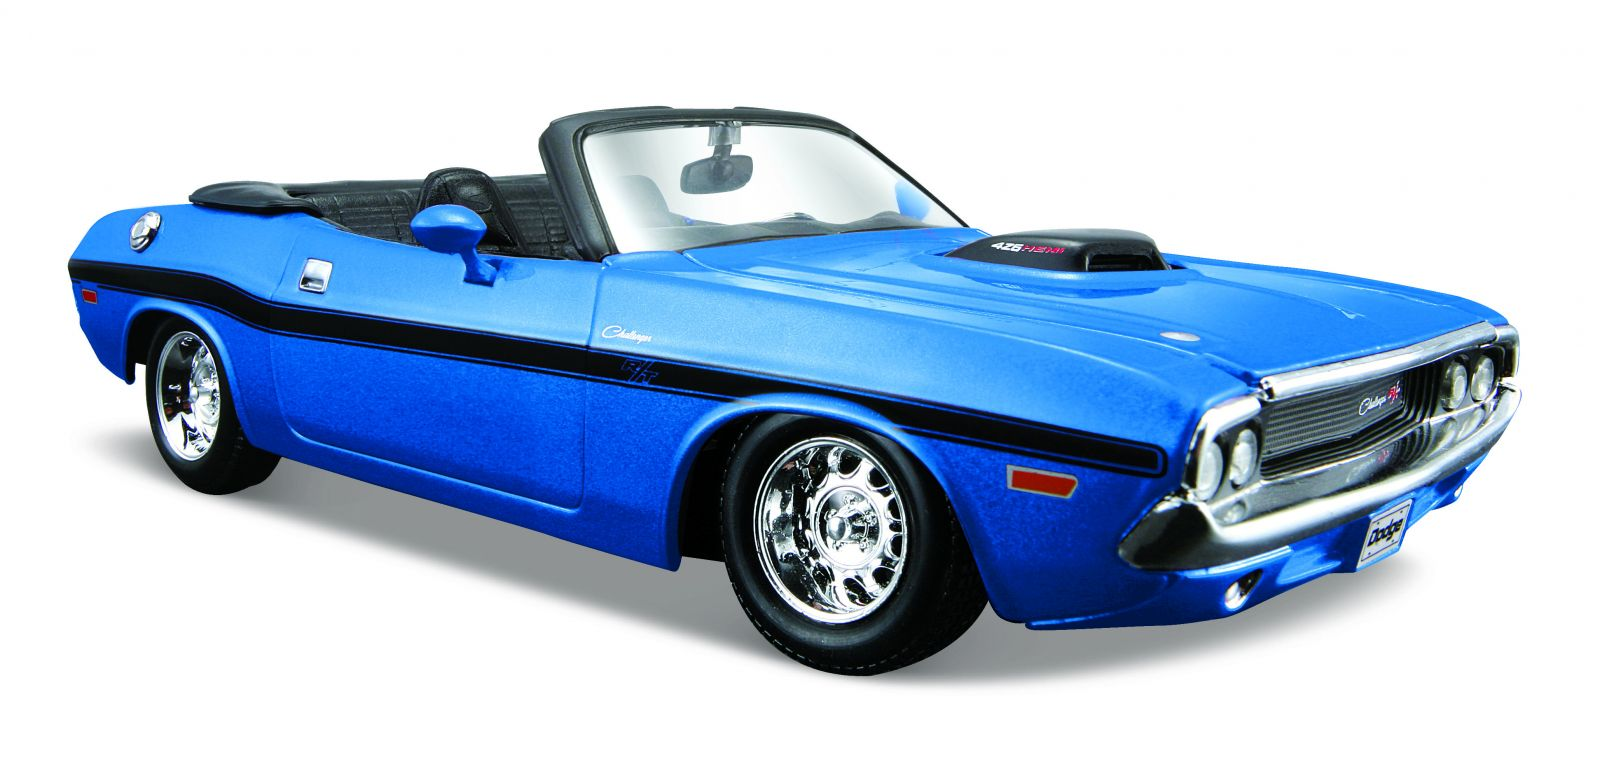 Maisto 1:24 Dodge Challenger R/T Convertible 1970 - modrá barva